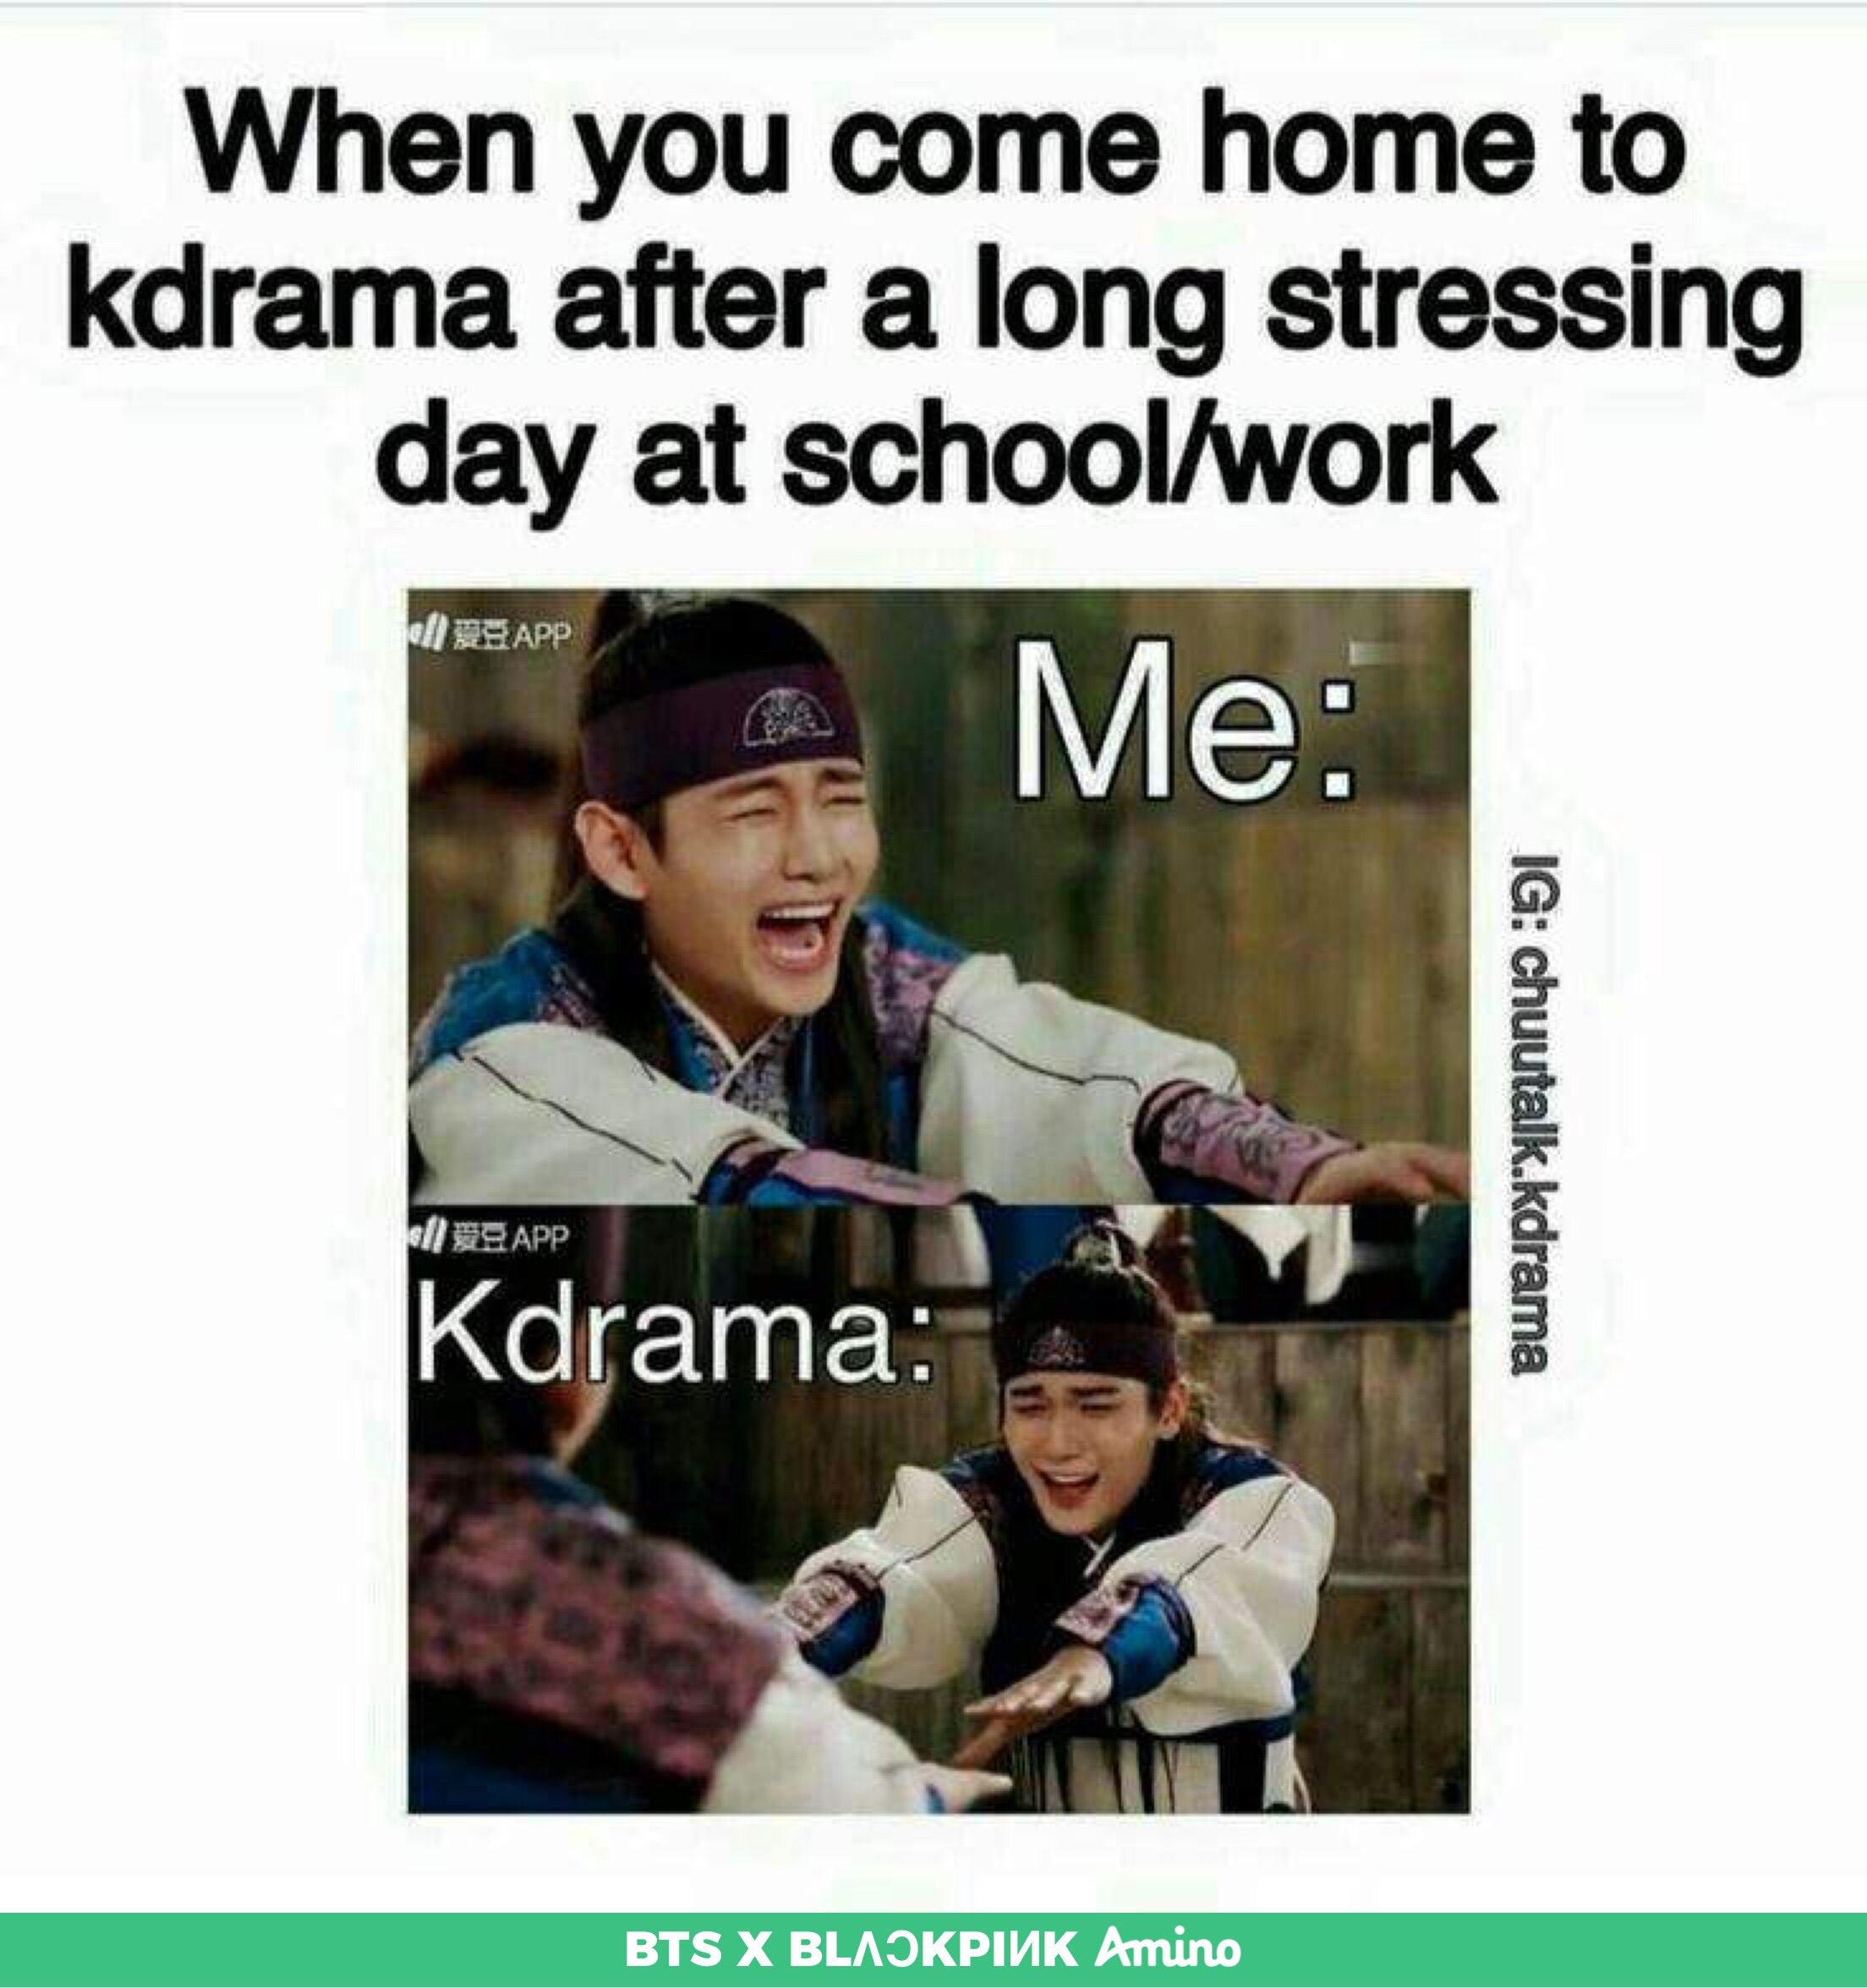 Pin By Bla Bla On Bts Relatable Memes Kdrama Funny Drama Memes Funny Kpop Memes